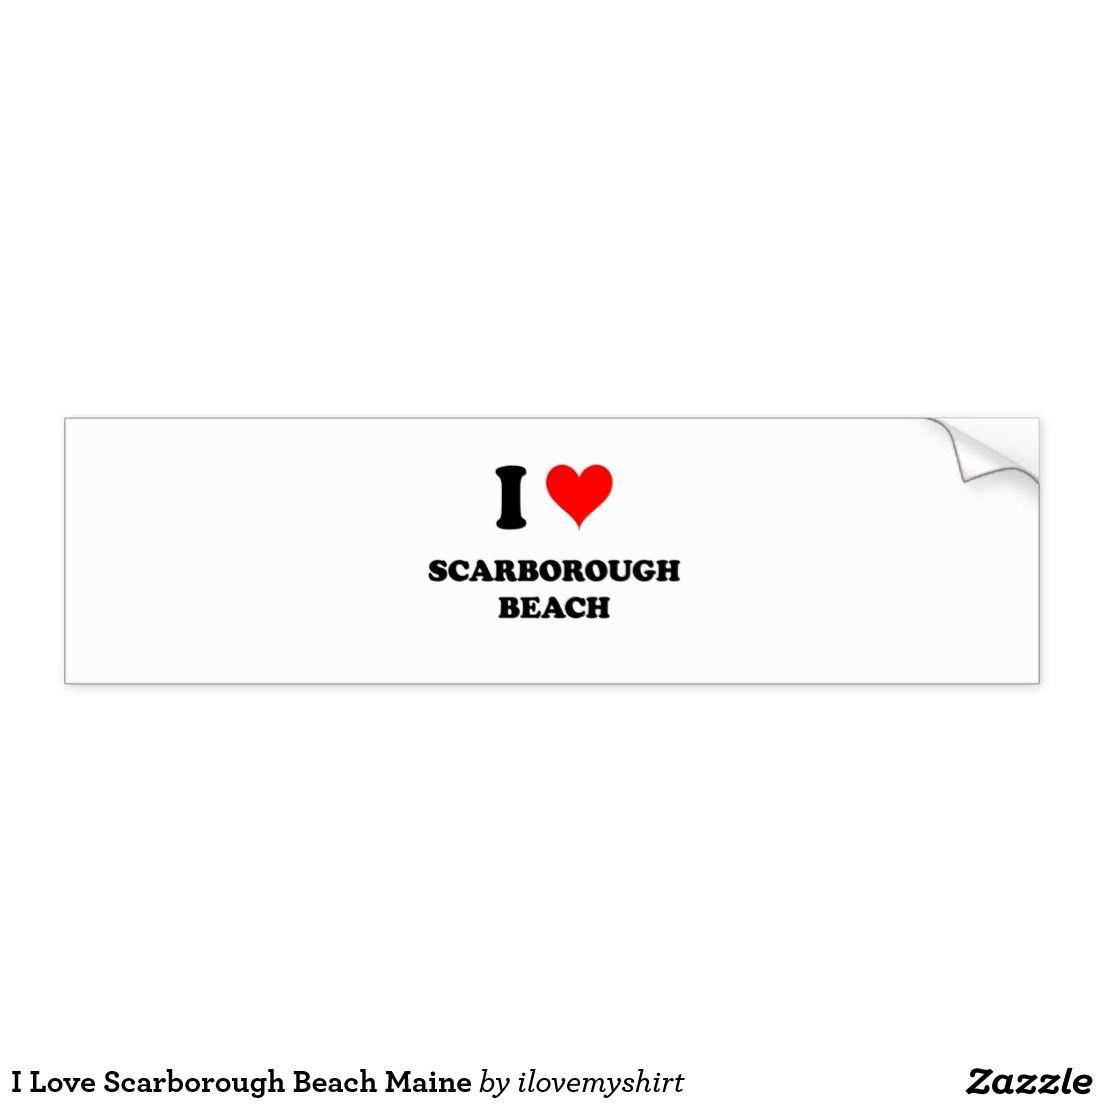 I Love Scarborough Beach Maine Bumper Sticker Zazzle Com Bumper Stickers Car Bumper Stickers Strong Adhesive [ 1104 x 1104 Pixel ]